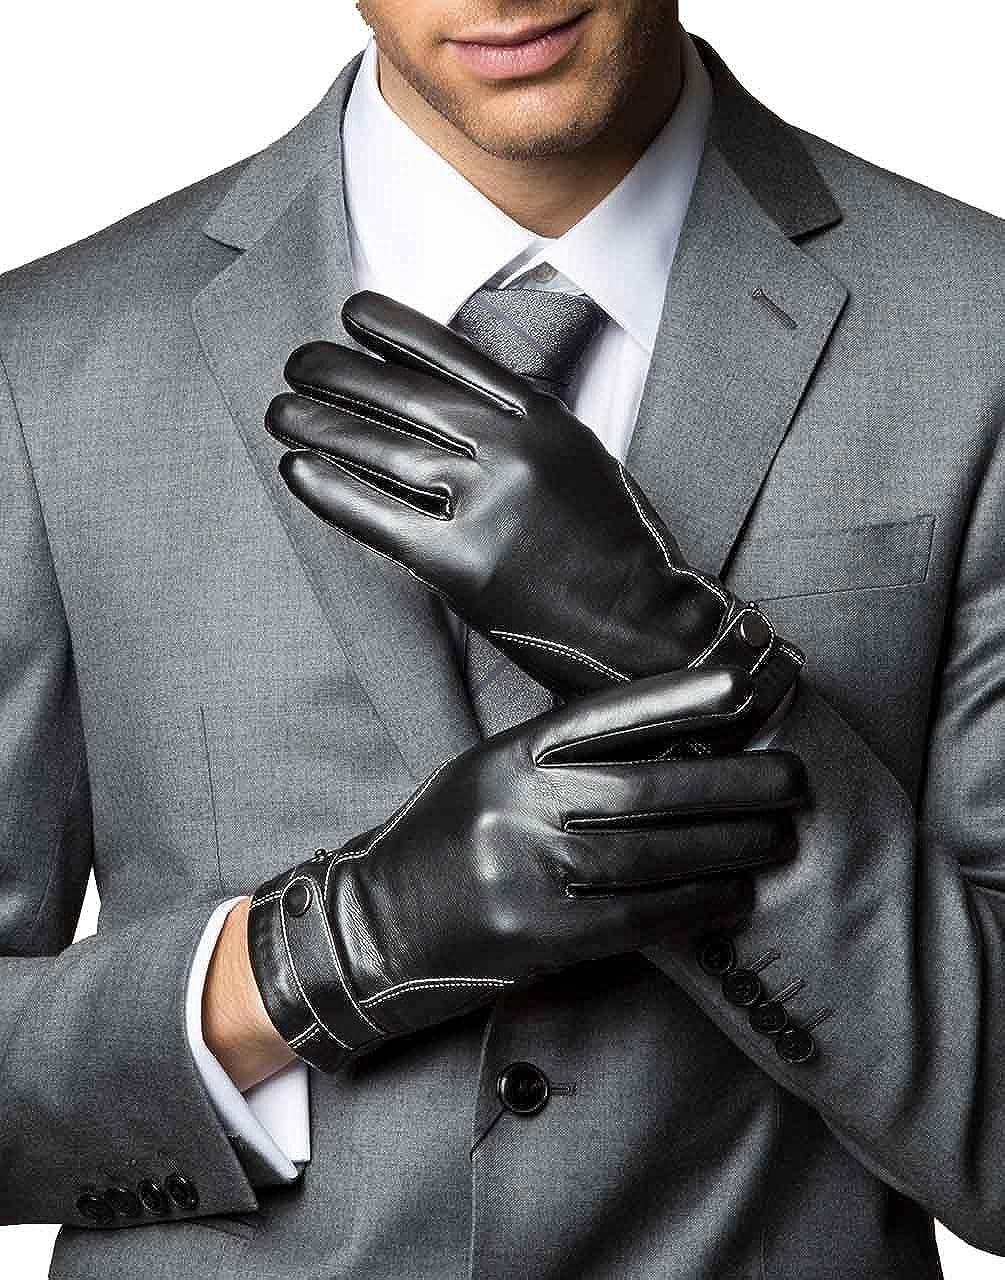 YISEVEN Men's Touchscreen Lambskin Winter Leather Gloves Slim